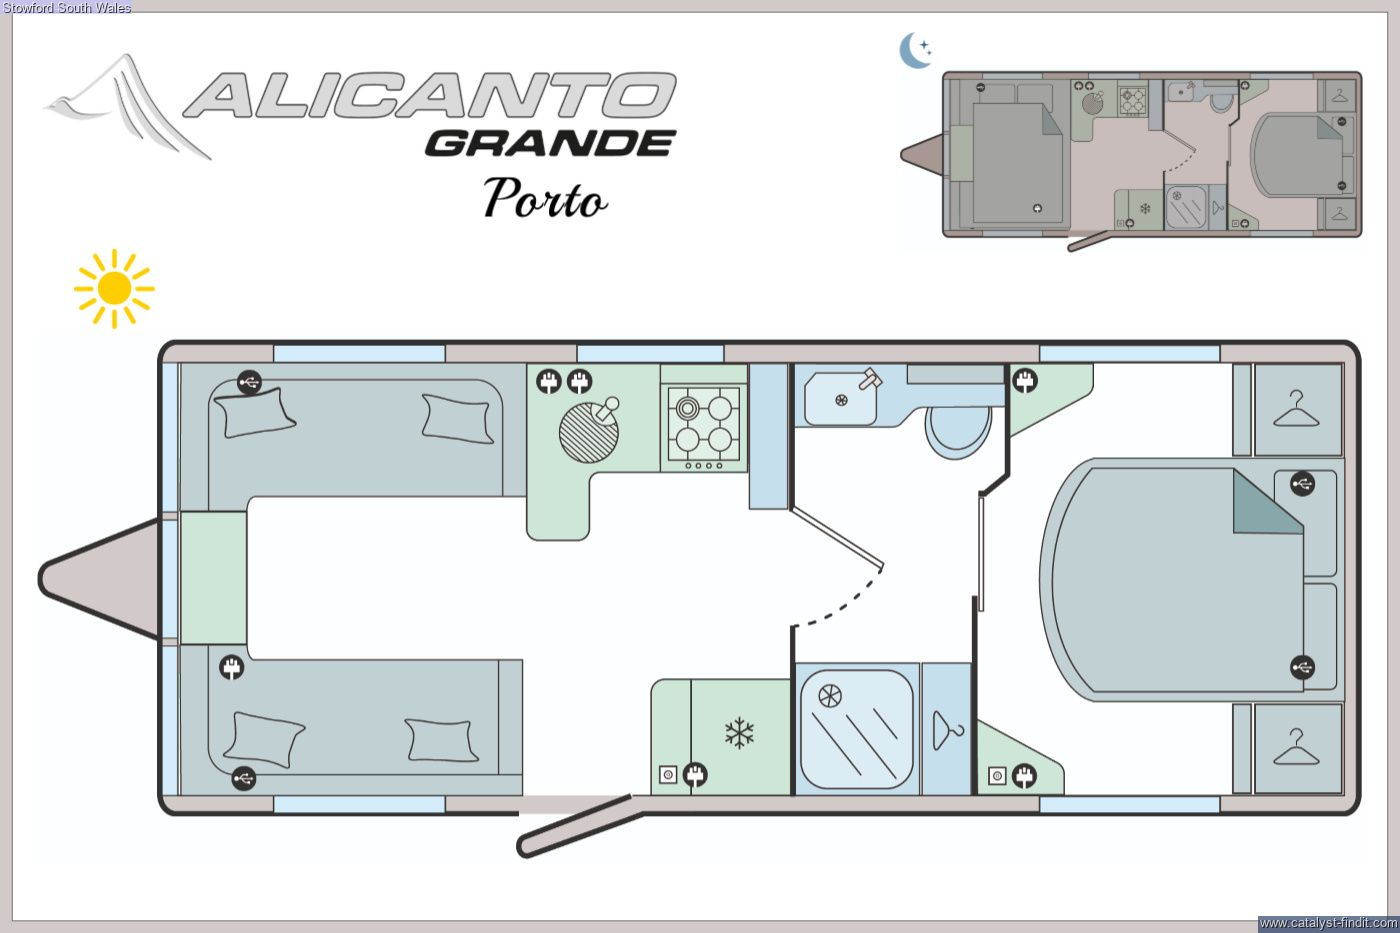 Bailey Alicanto Grande Porto 2020